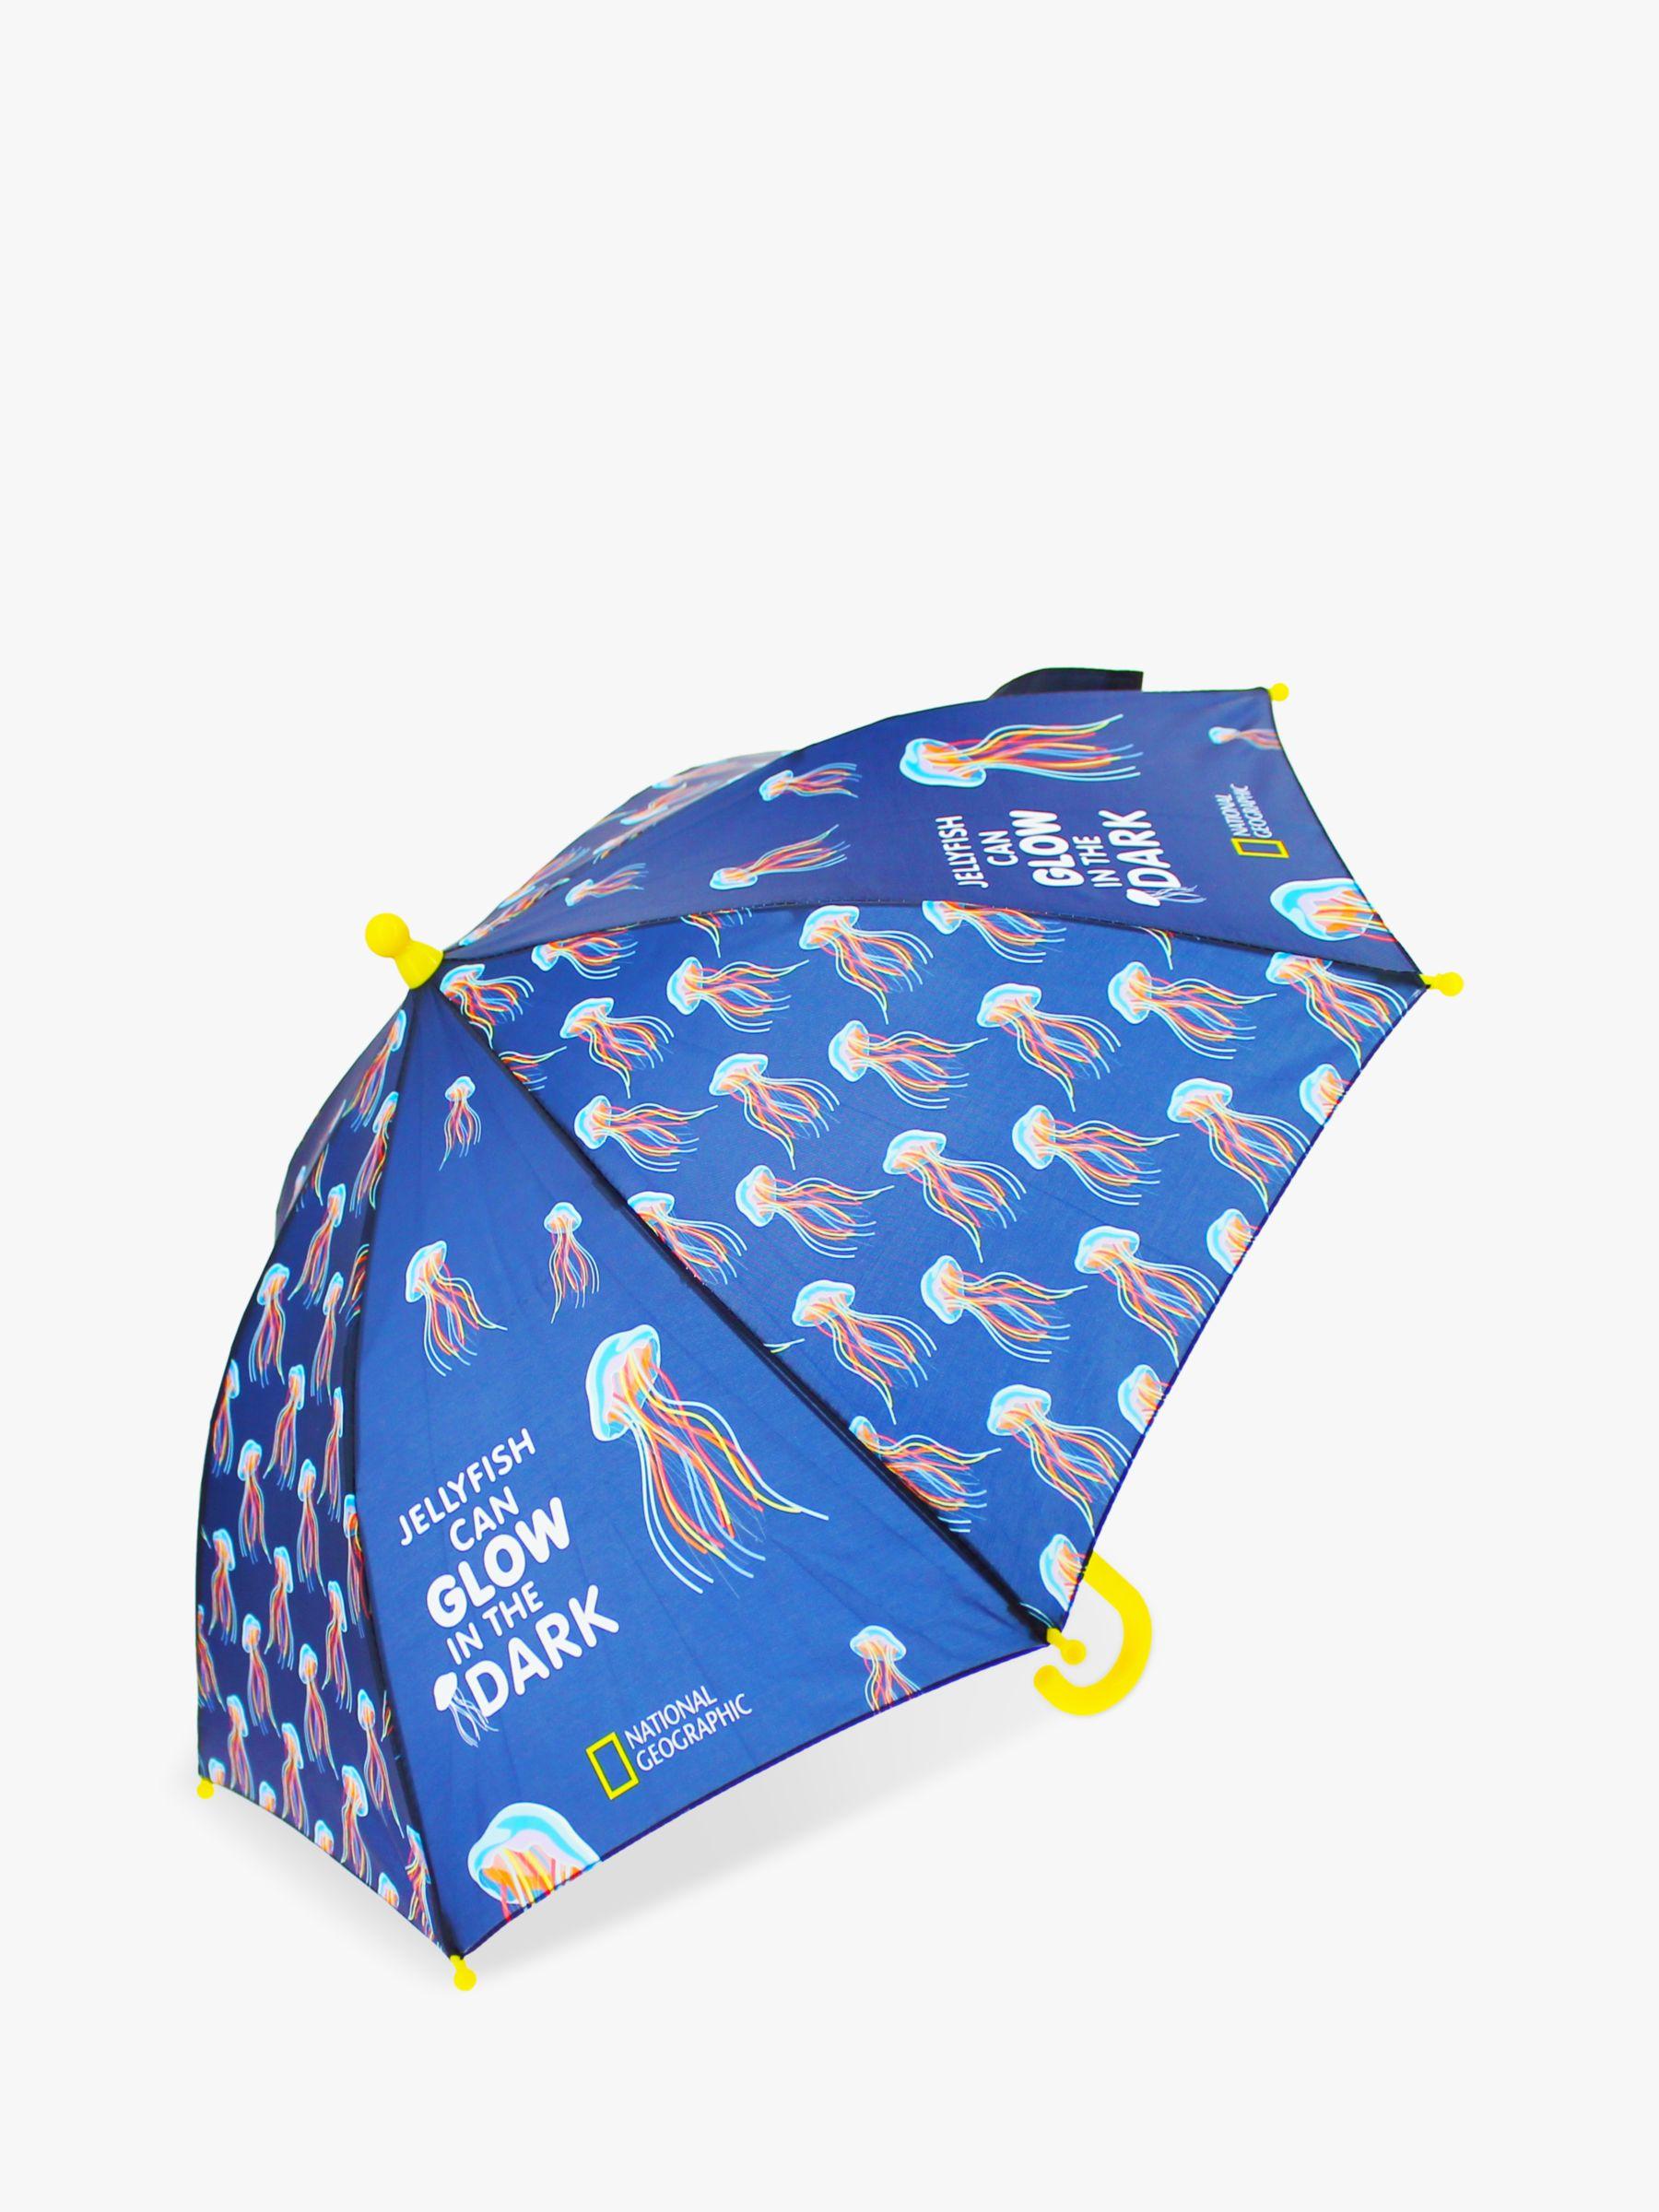 National Geographic National Geographic Jellyfish Umbrella